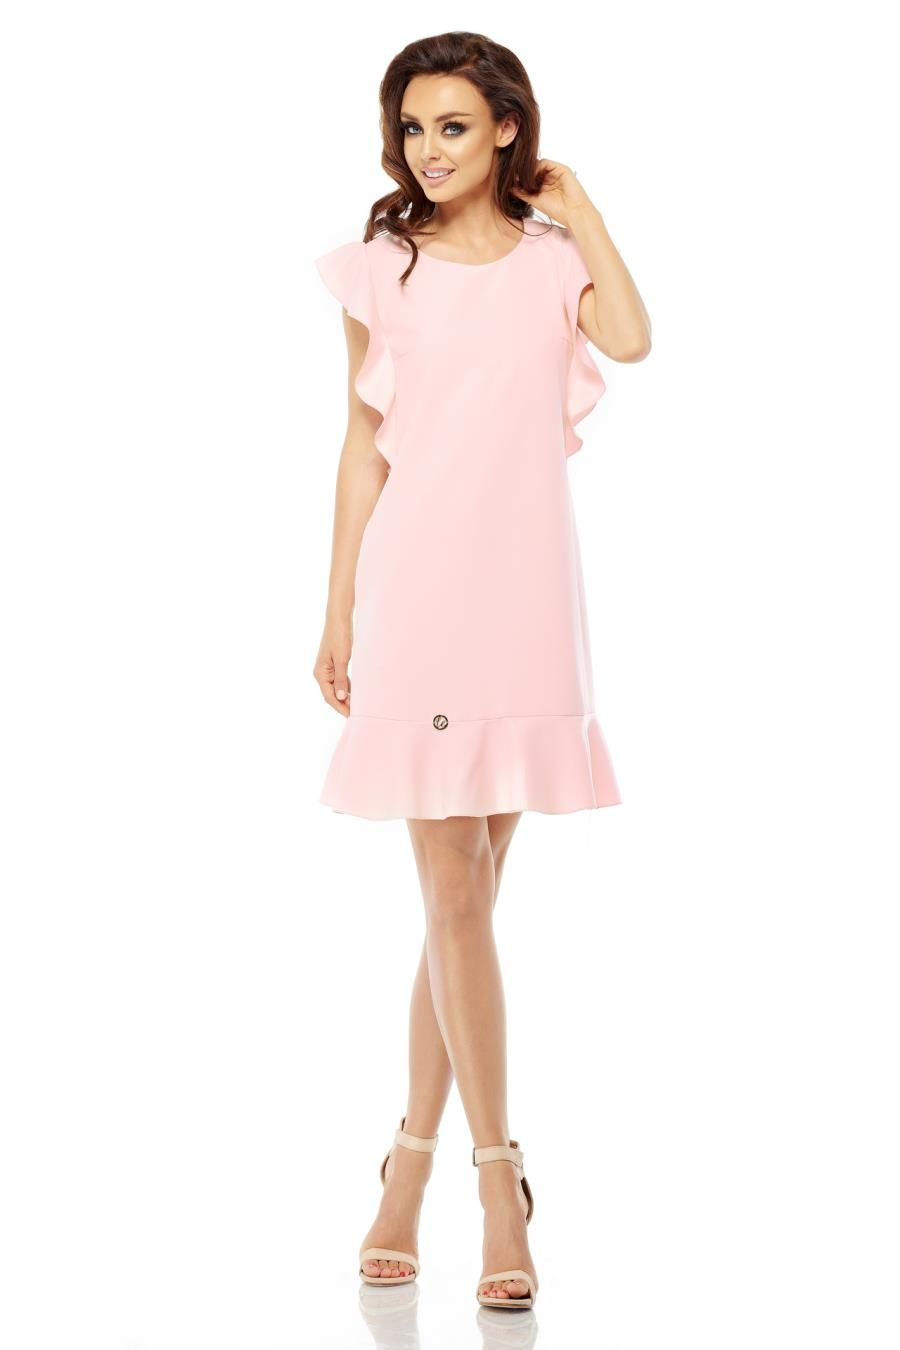 21e182a7b4 Trapezowa Sukienka z Falbankami Różowa LEL248